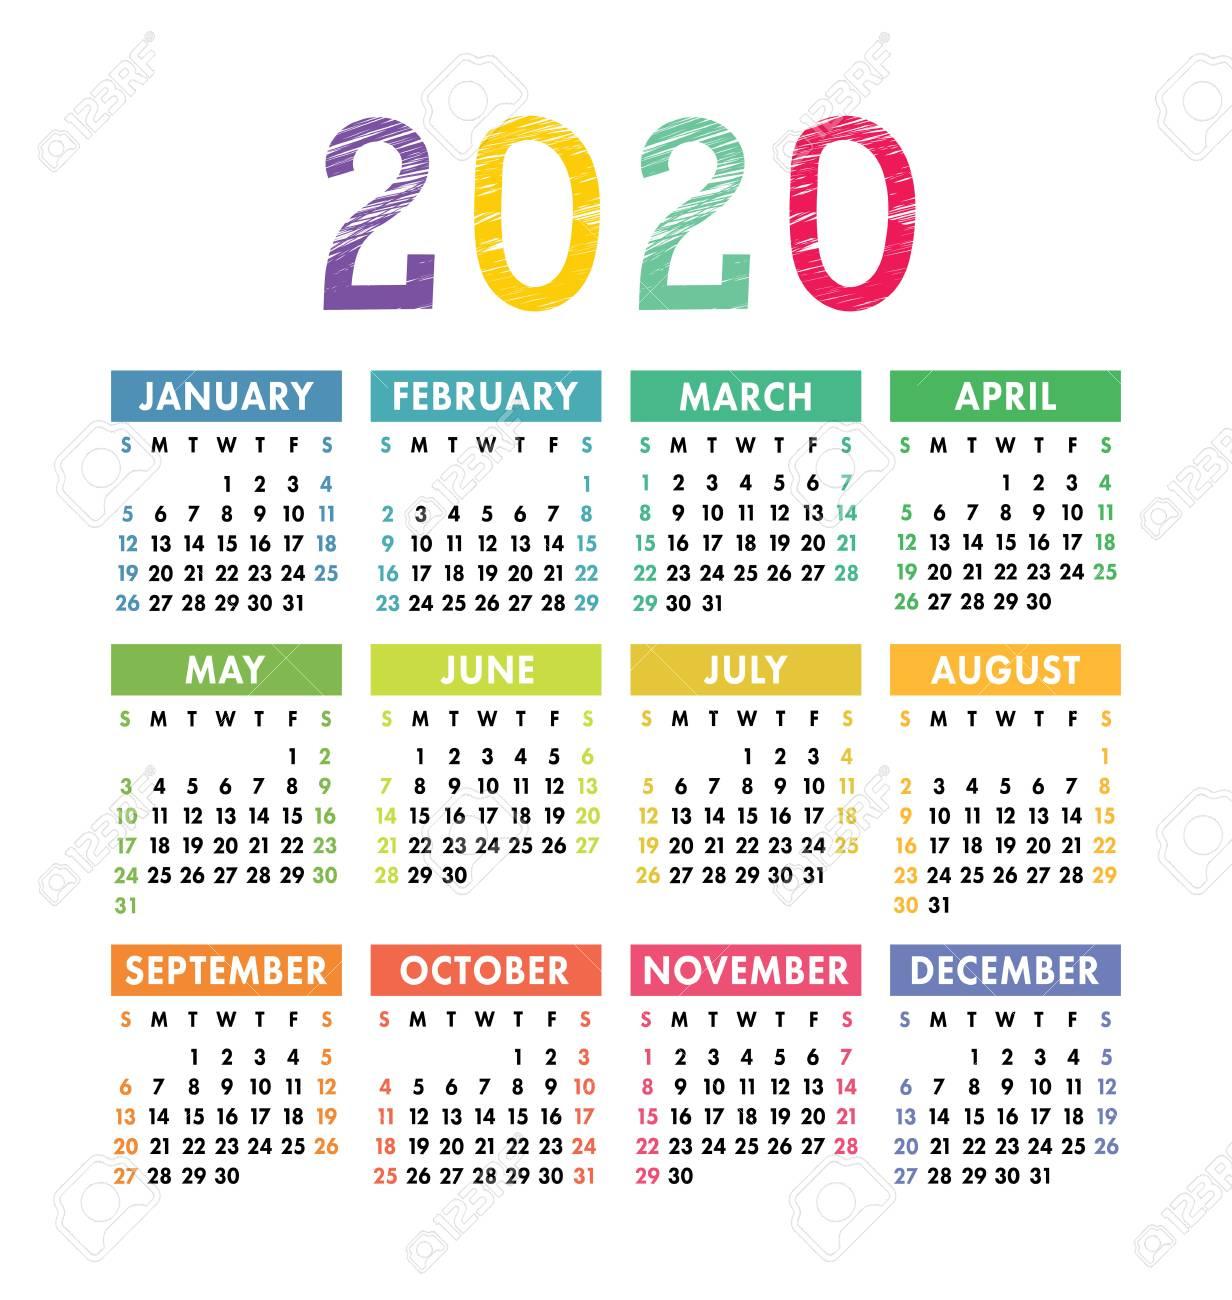 Printable Pocket Calendar 2020 - Wpa.wpart.co with regard to Printable Pocket Calandwe 2020